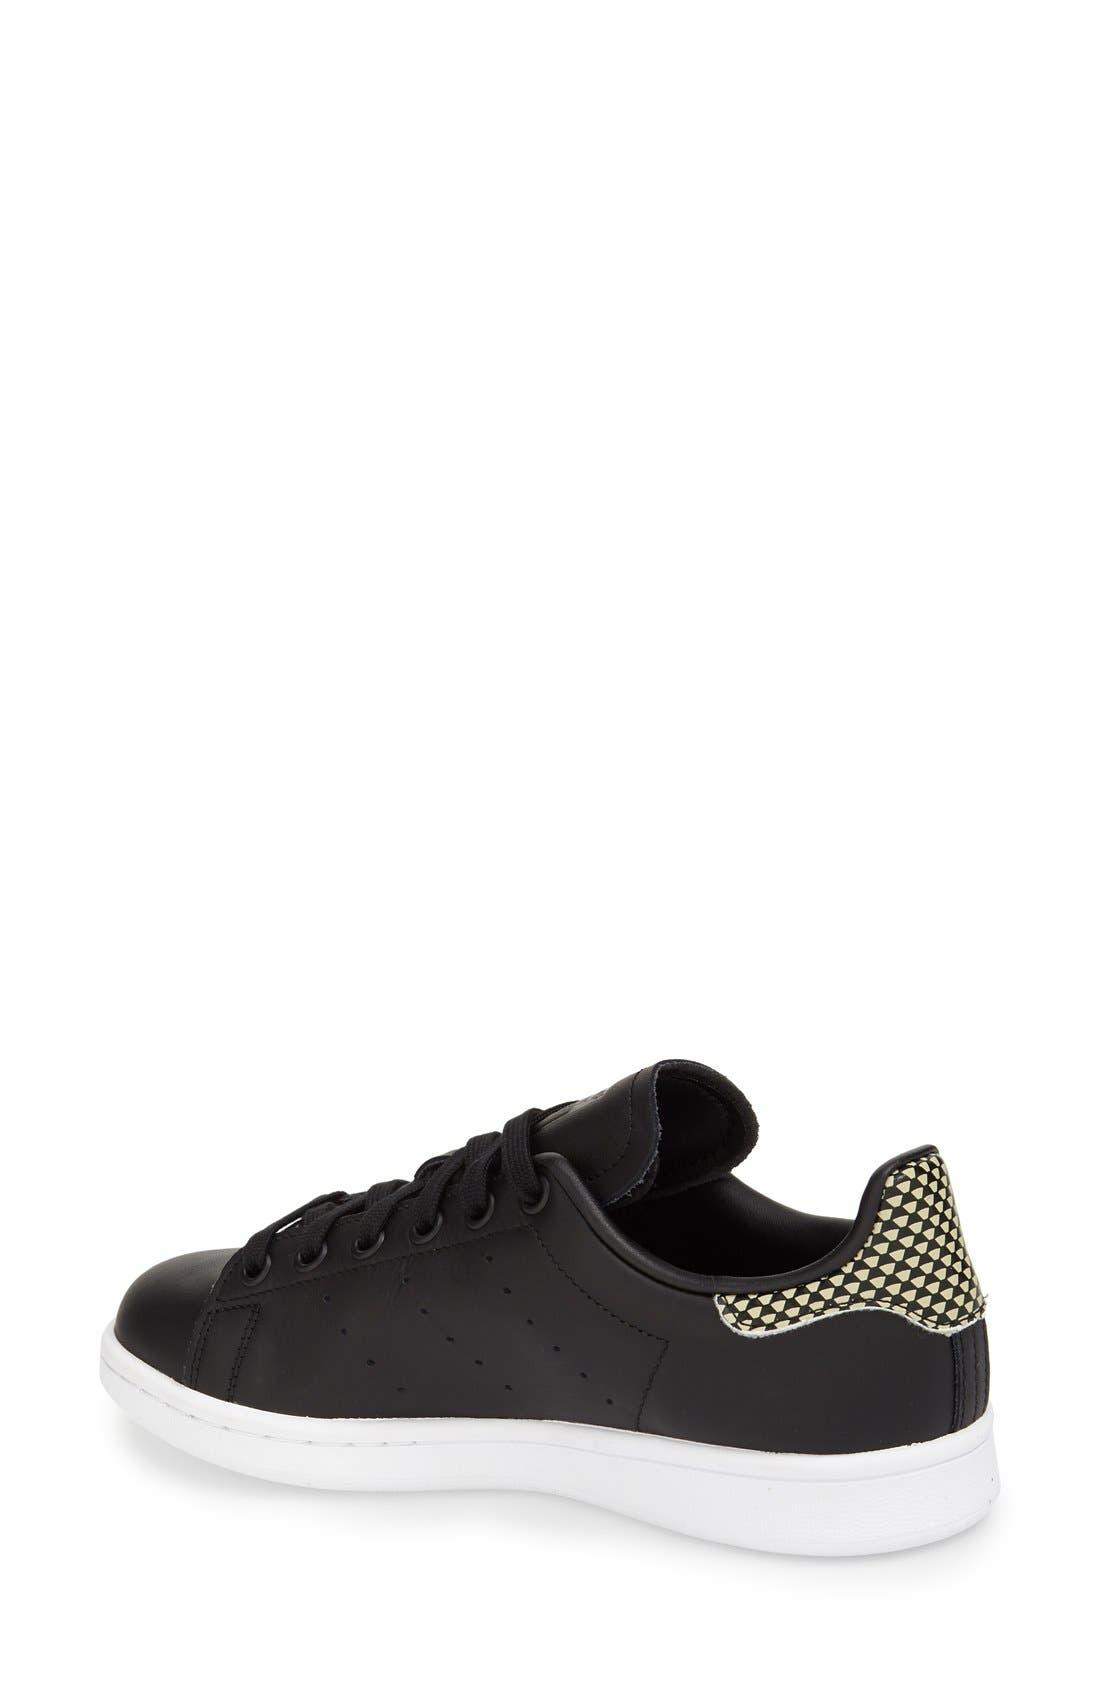 'Stan Smith' Sneaker,                             Alternate thumbnail 75, color,